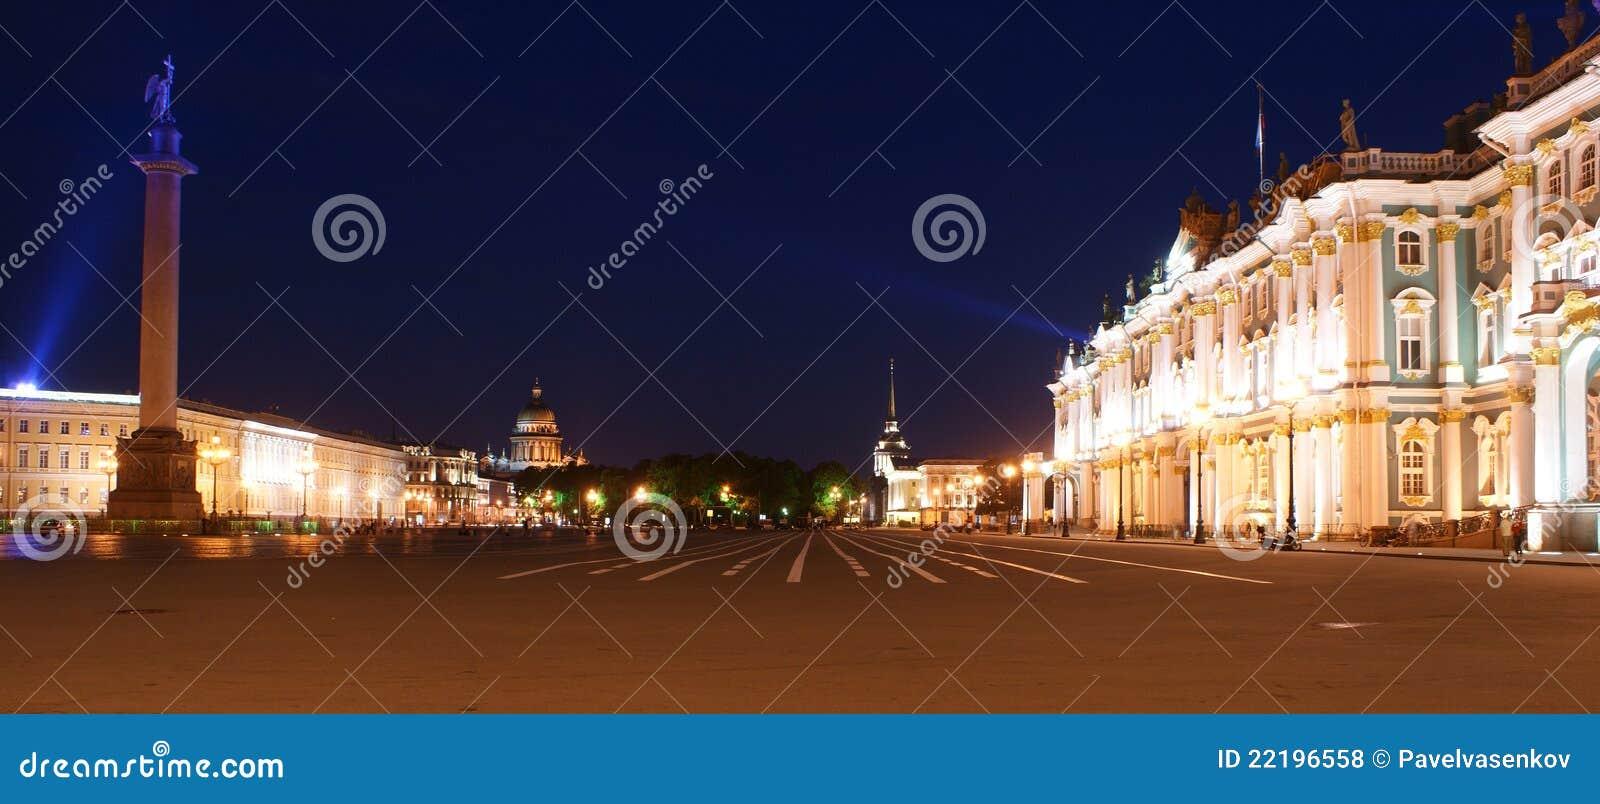 St petersburg России панорамы дворца квадратный